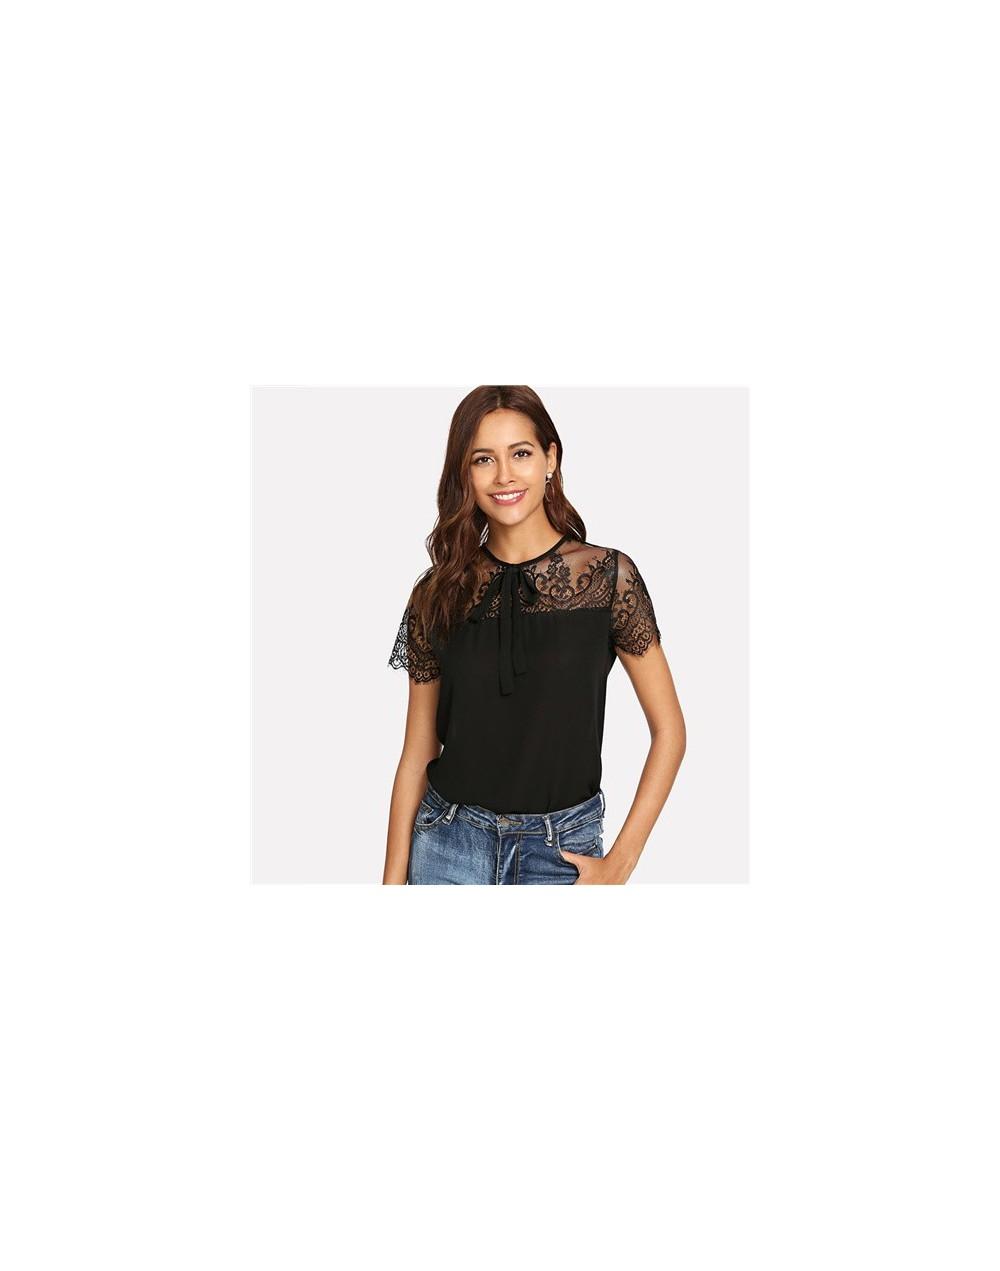 Tie Neck Lace Shoulder Top Short Sleeve Button Black Blouse Summer Tops For Women 2019 Office Ladies Elegant Blouses - Black...